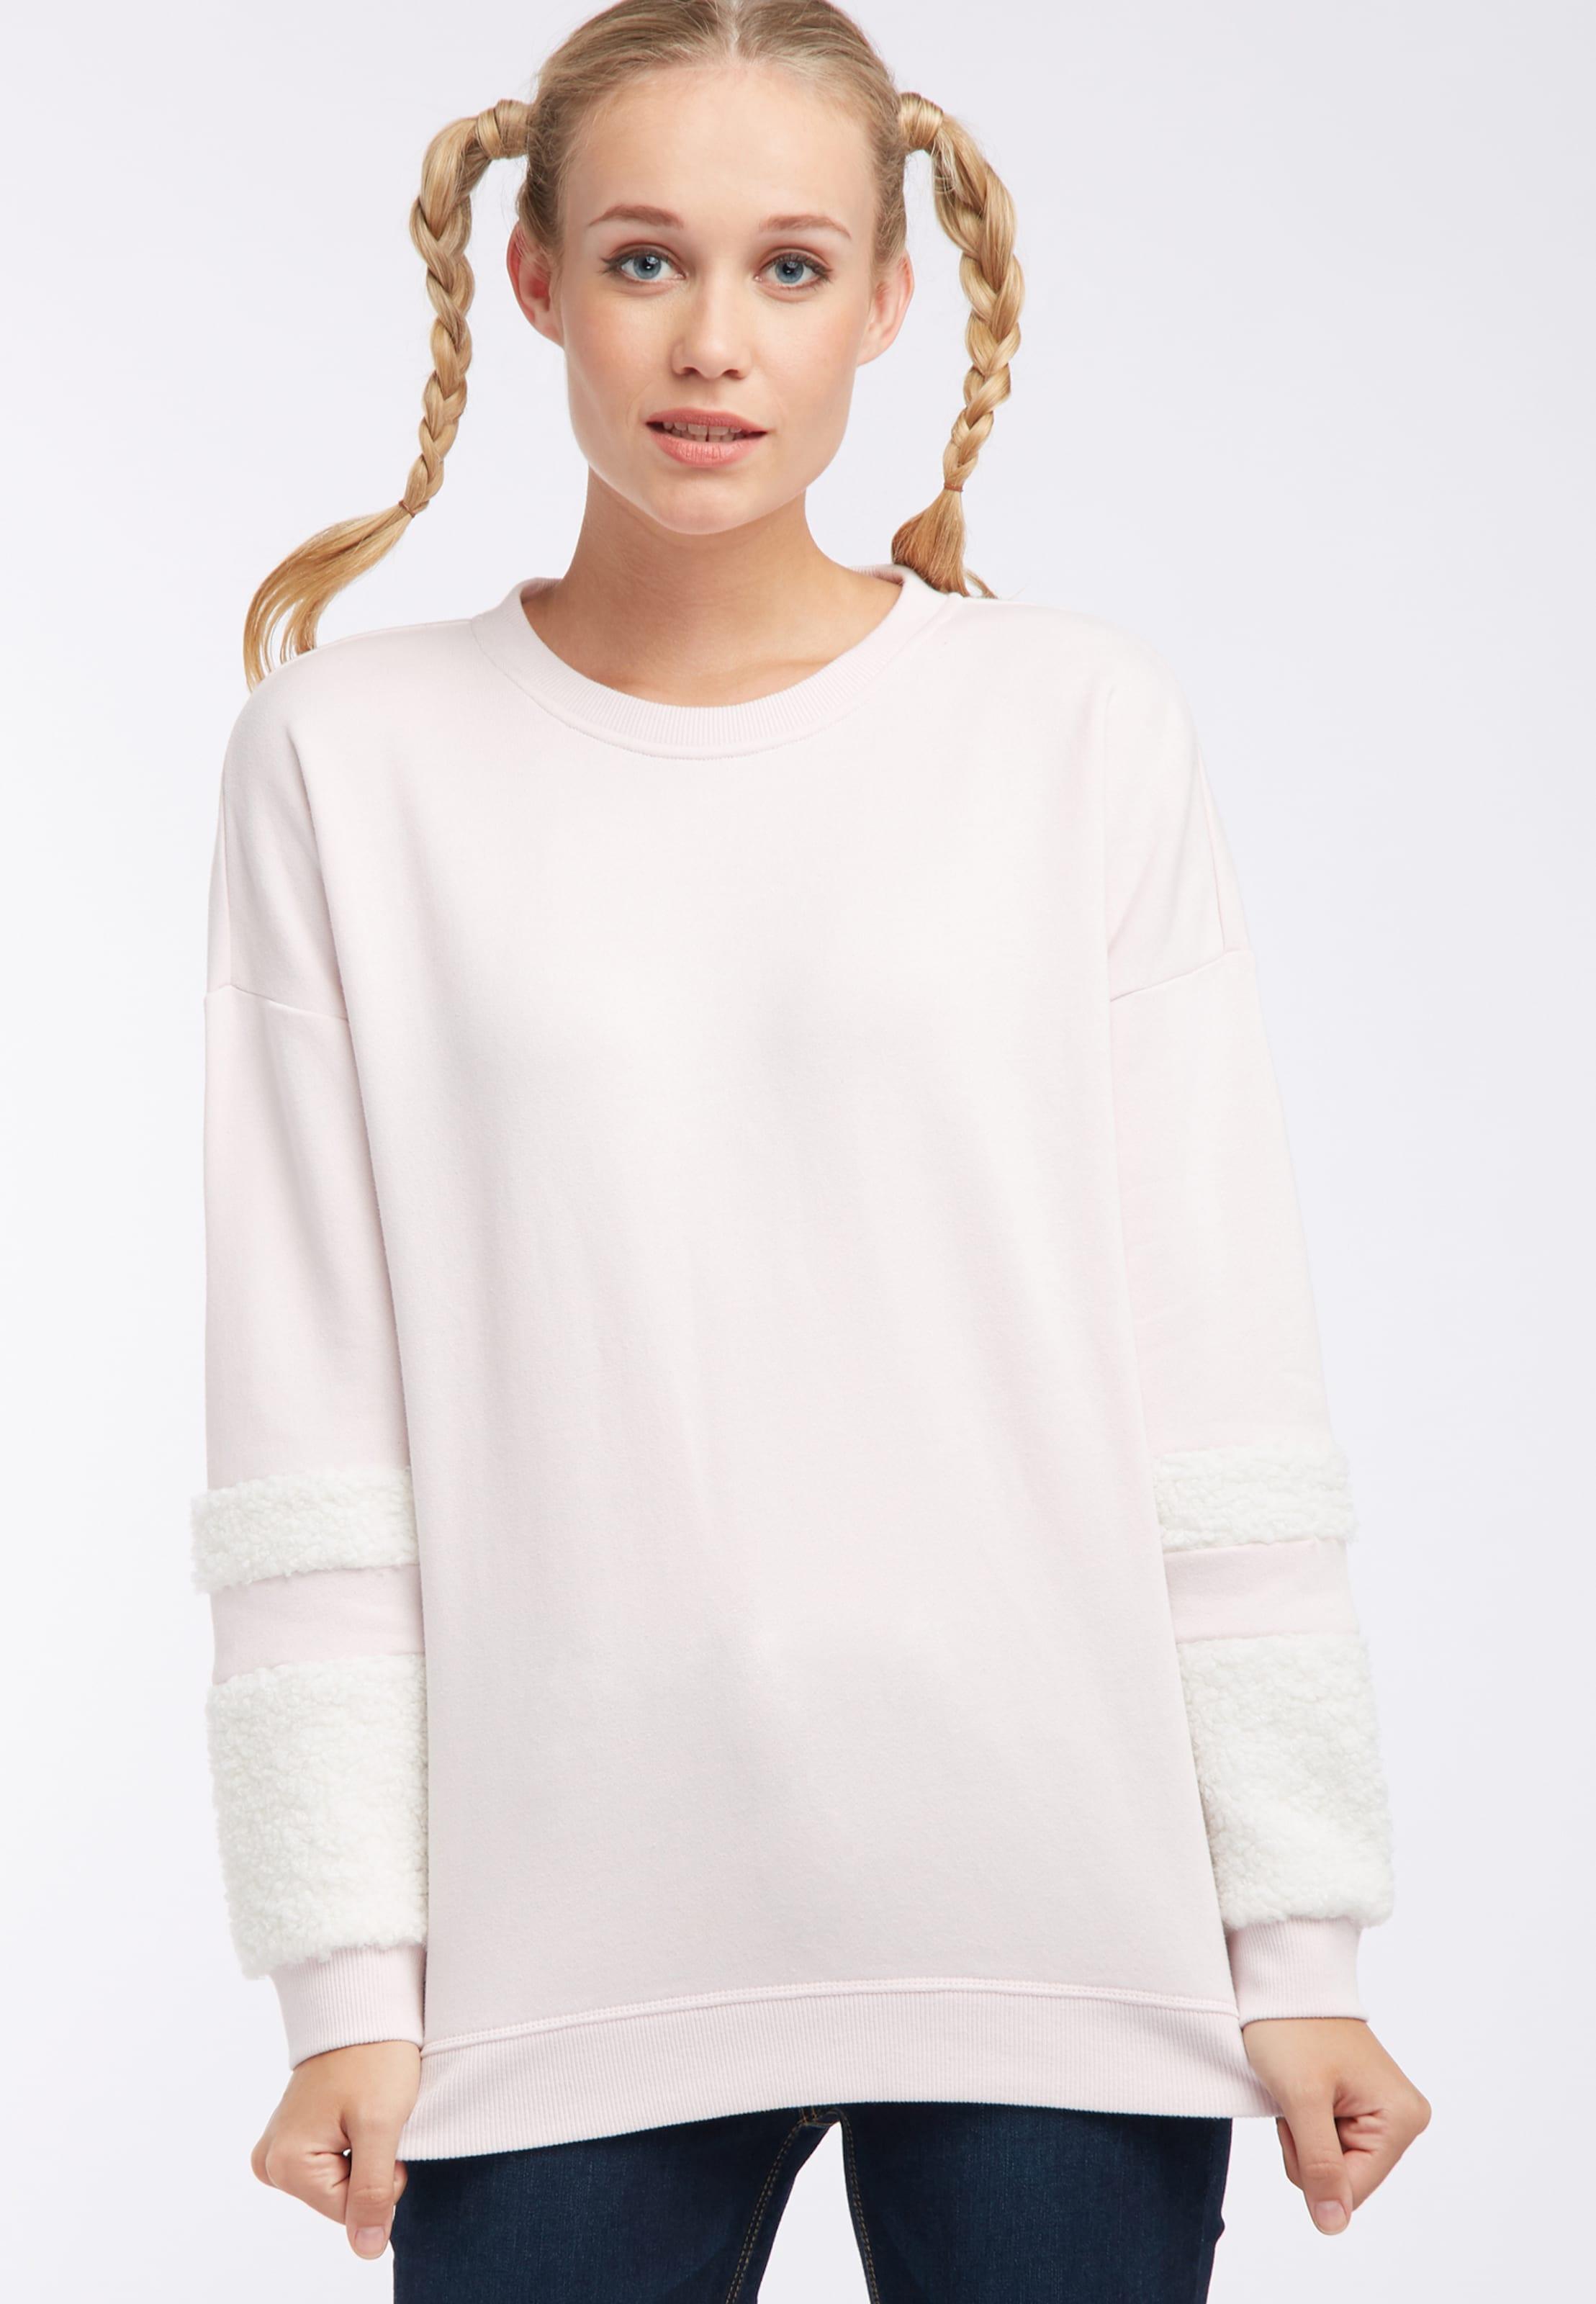 shirt shirt Mymo Mymo Mymo CrèmeRose CrèmeRose Sweat En Sweat En shirt Sweat En EDHW2I9